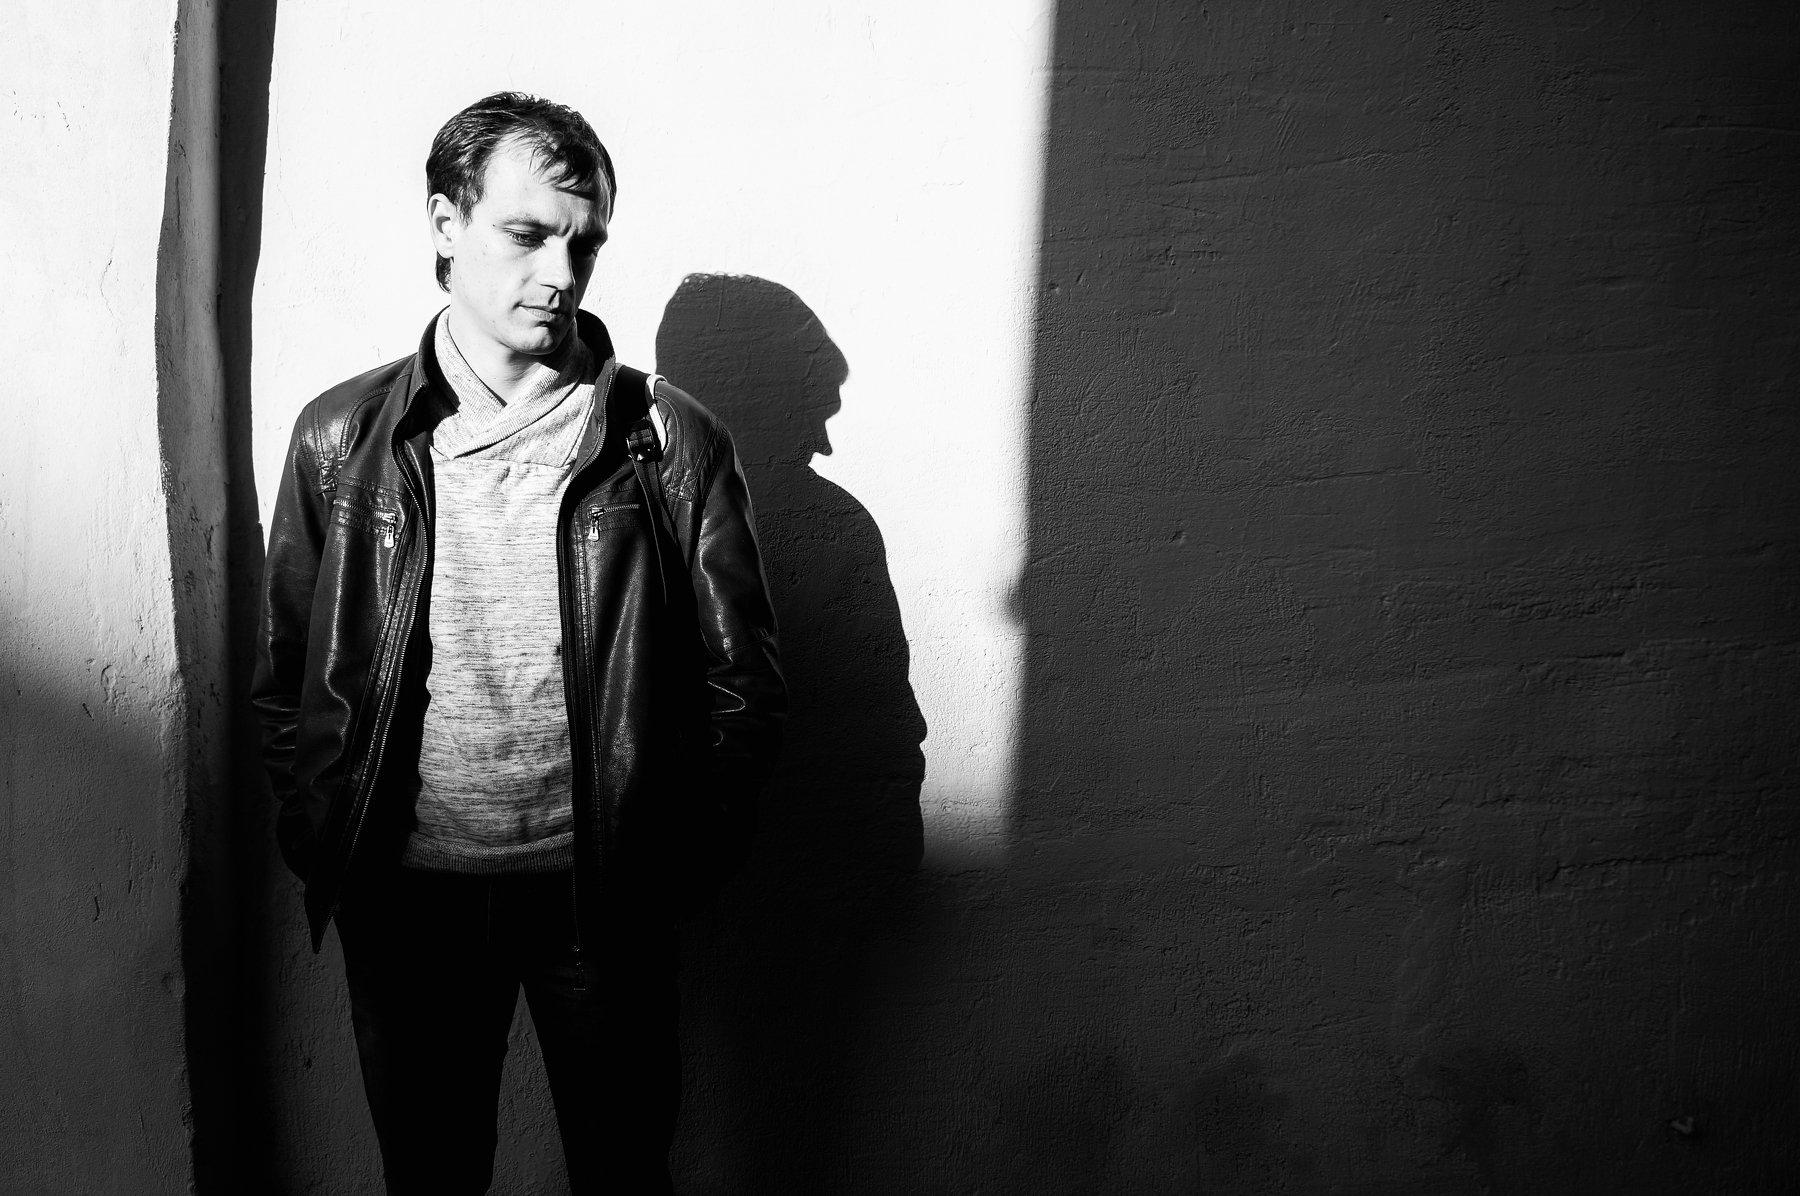 мужчина, портрет, свет, тень, masyaxa